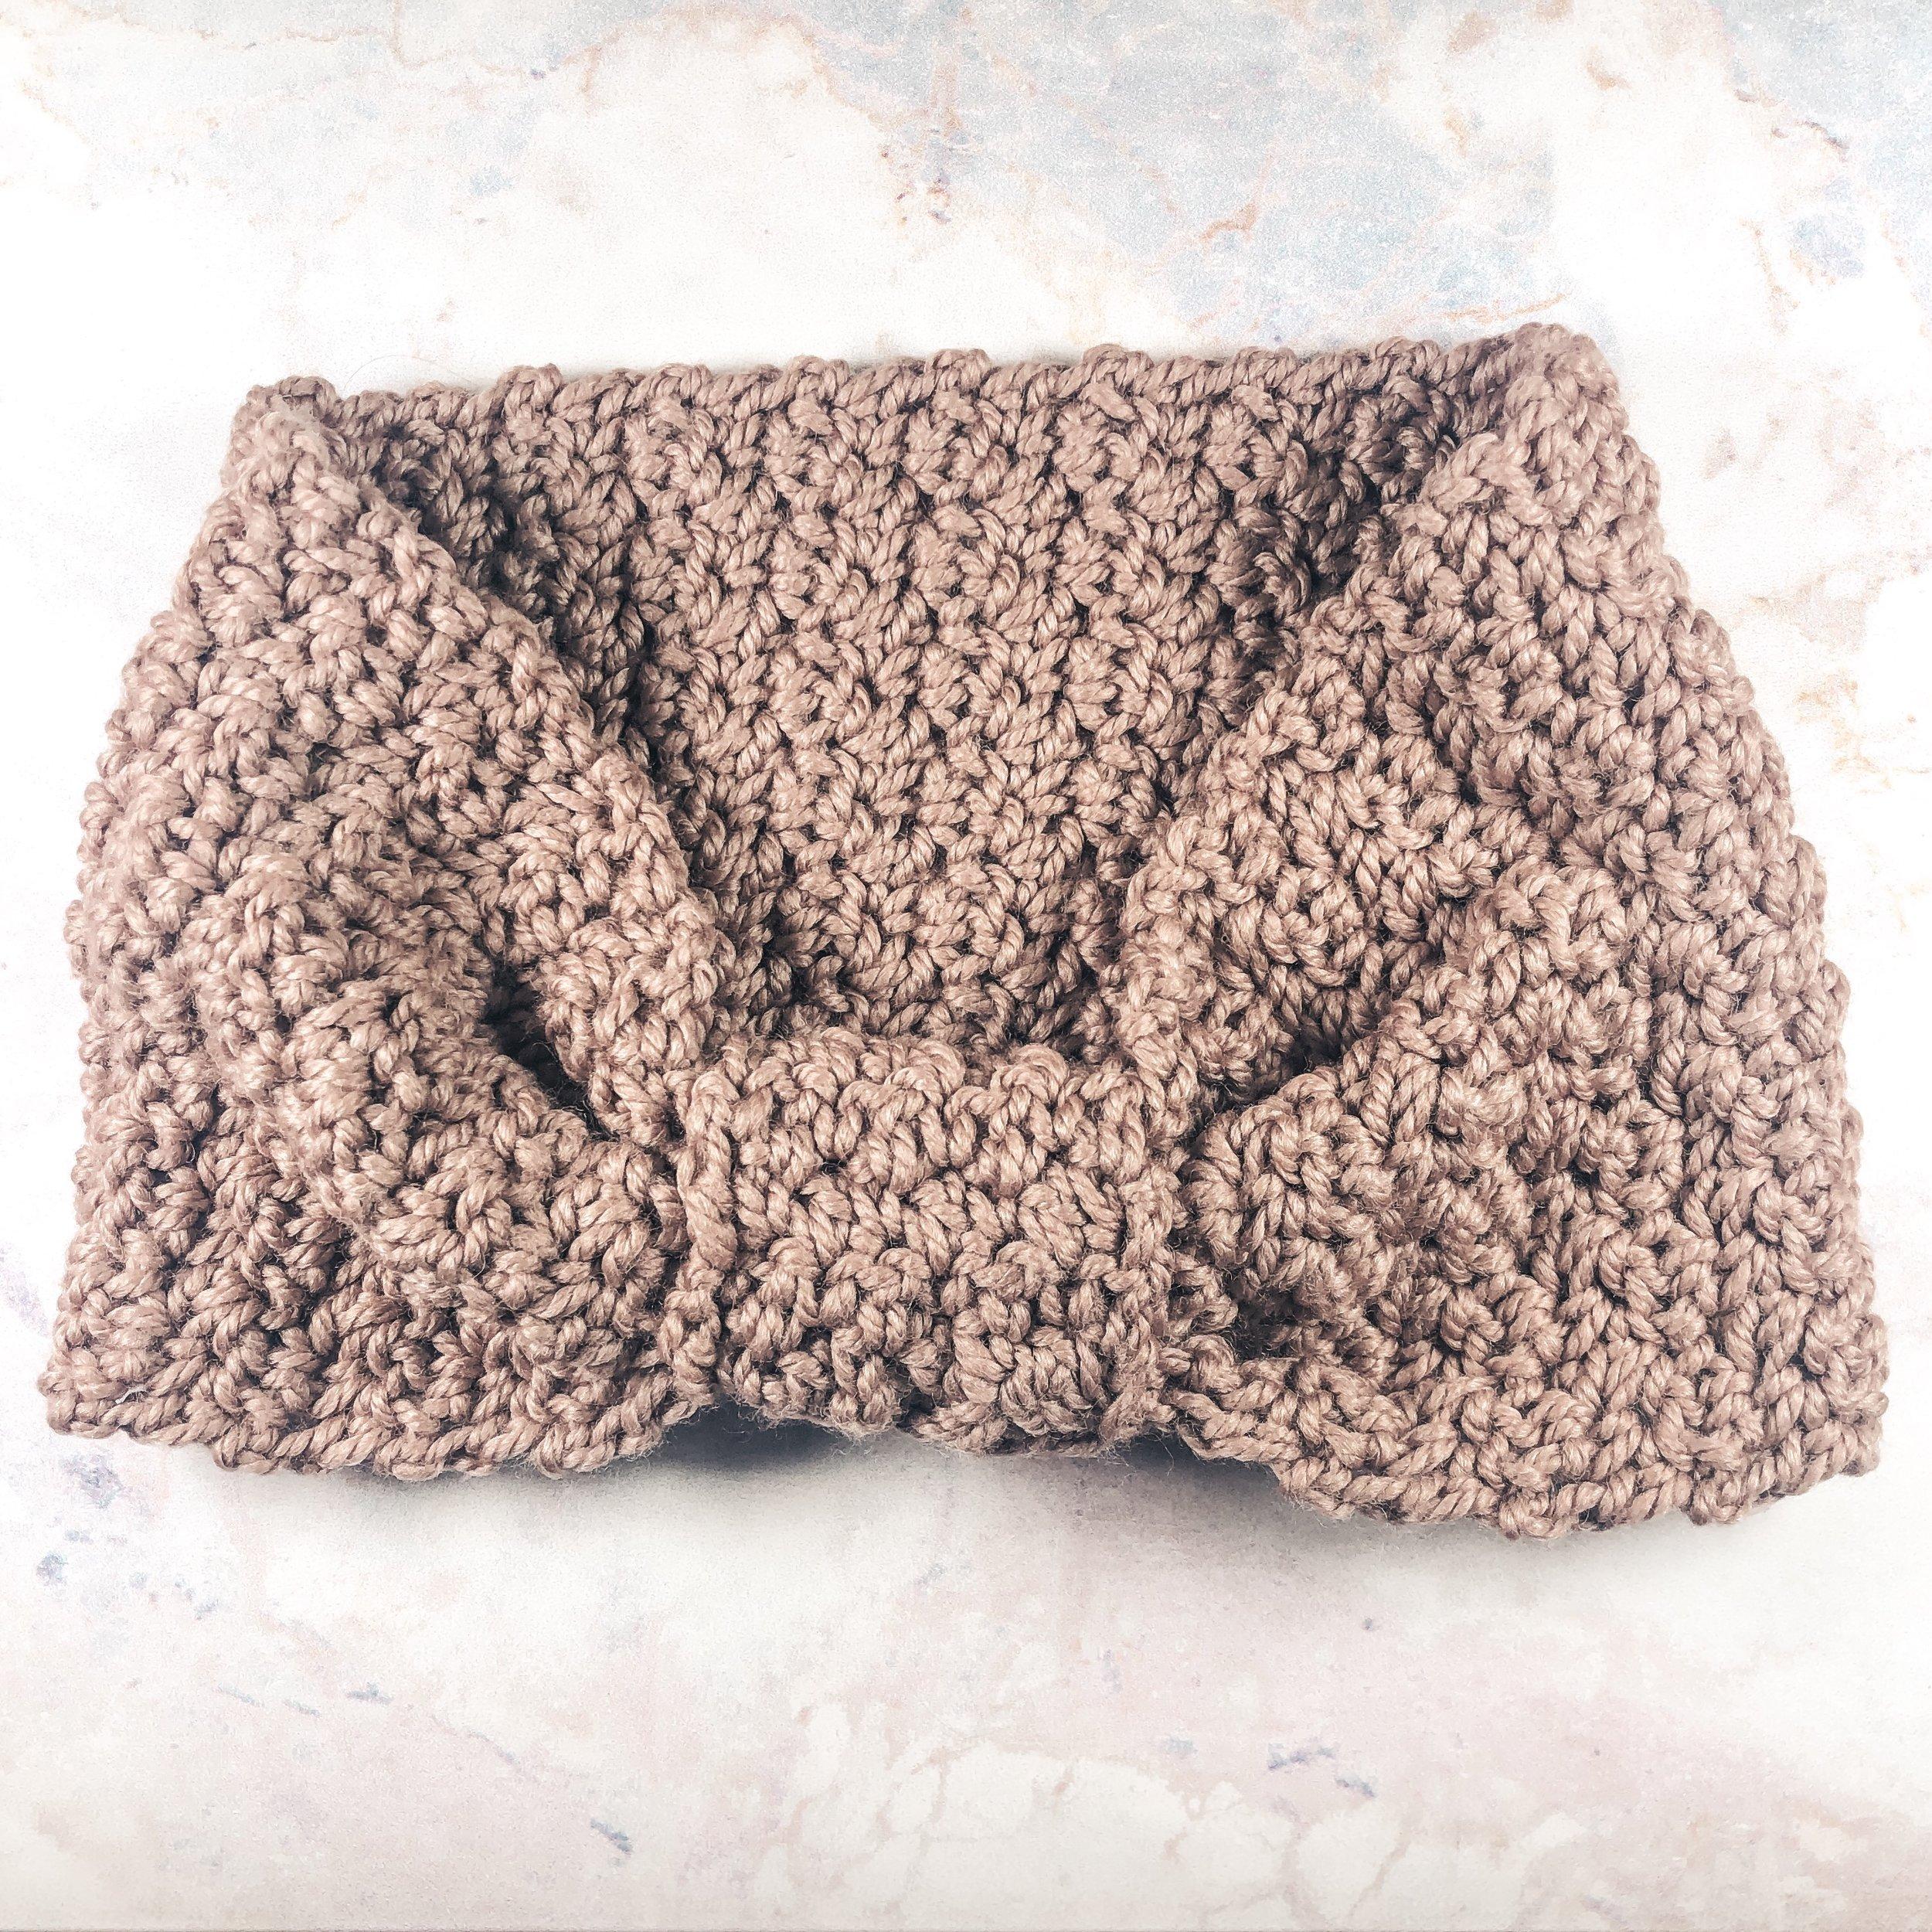 Wilderness Headband - Crochet Pattern - The Roving Nomad